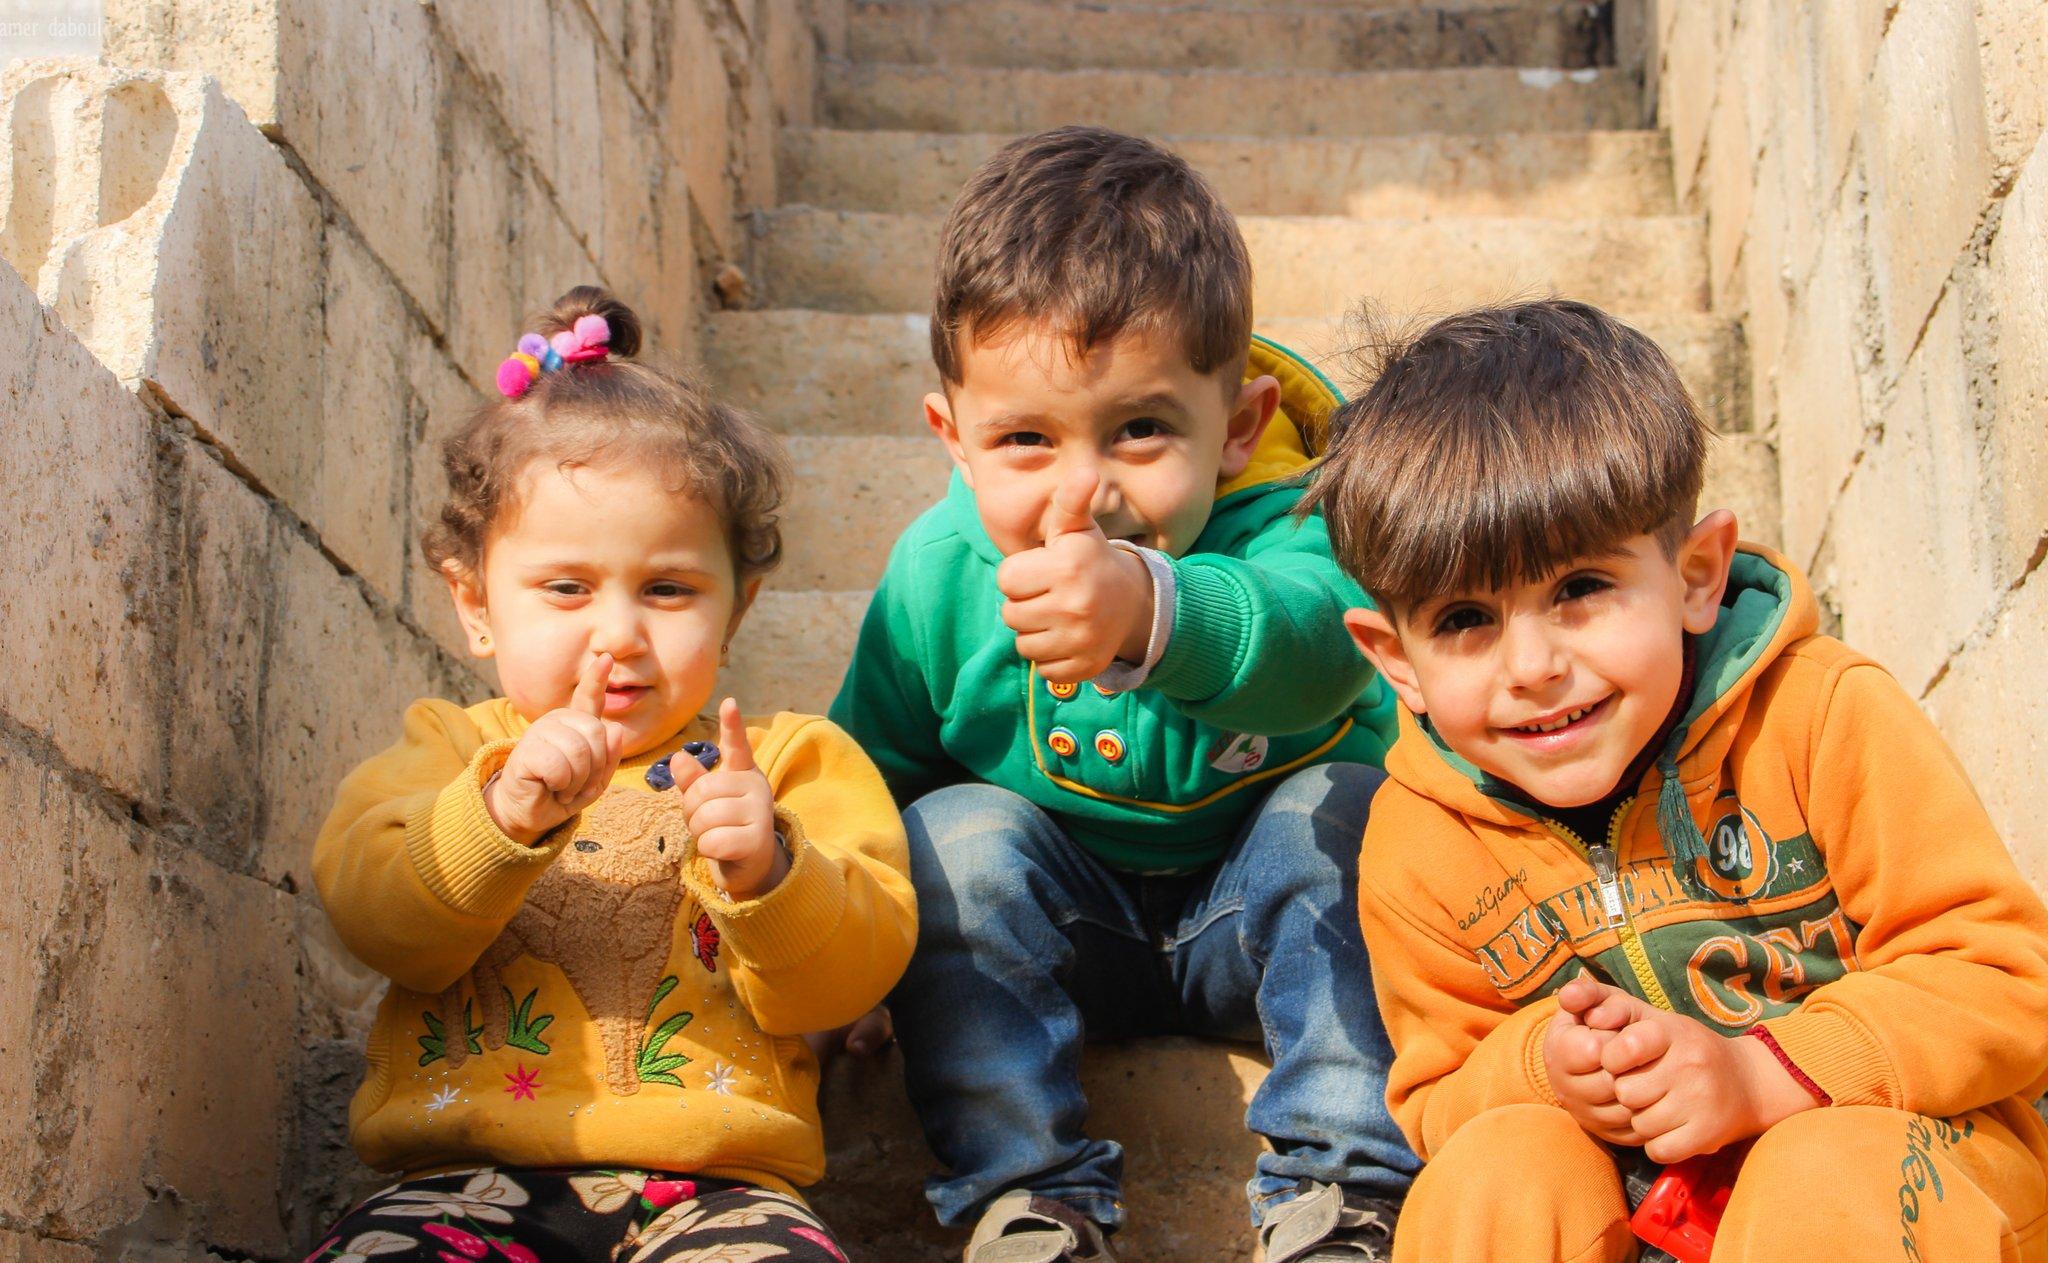 POPSUGAR: What It's Like Having 3 Kids